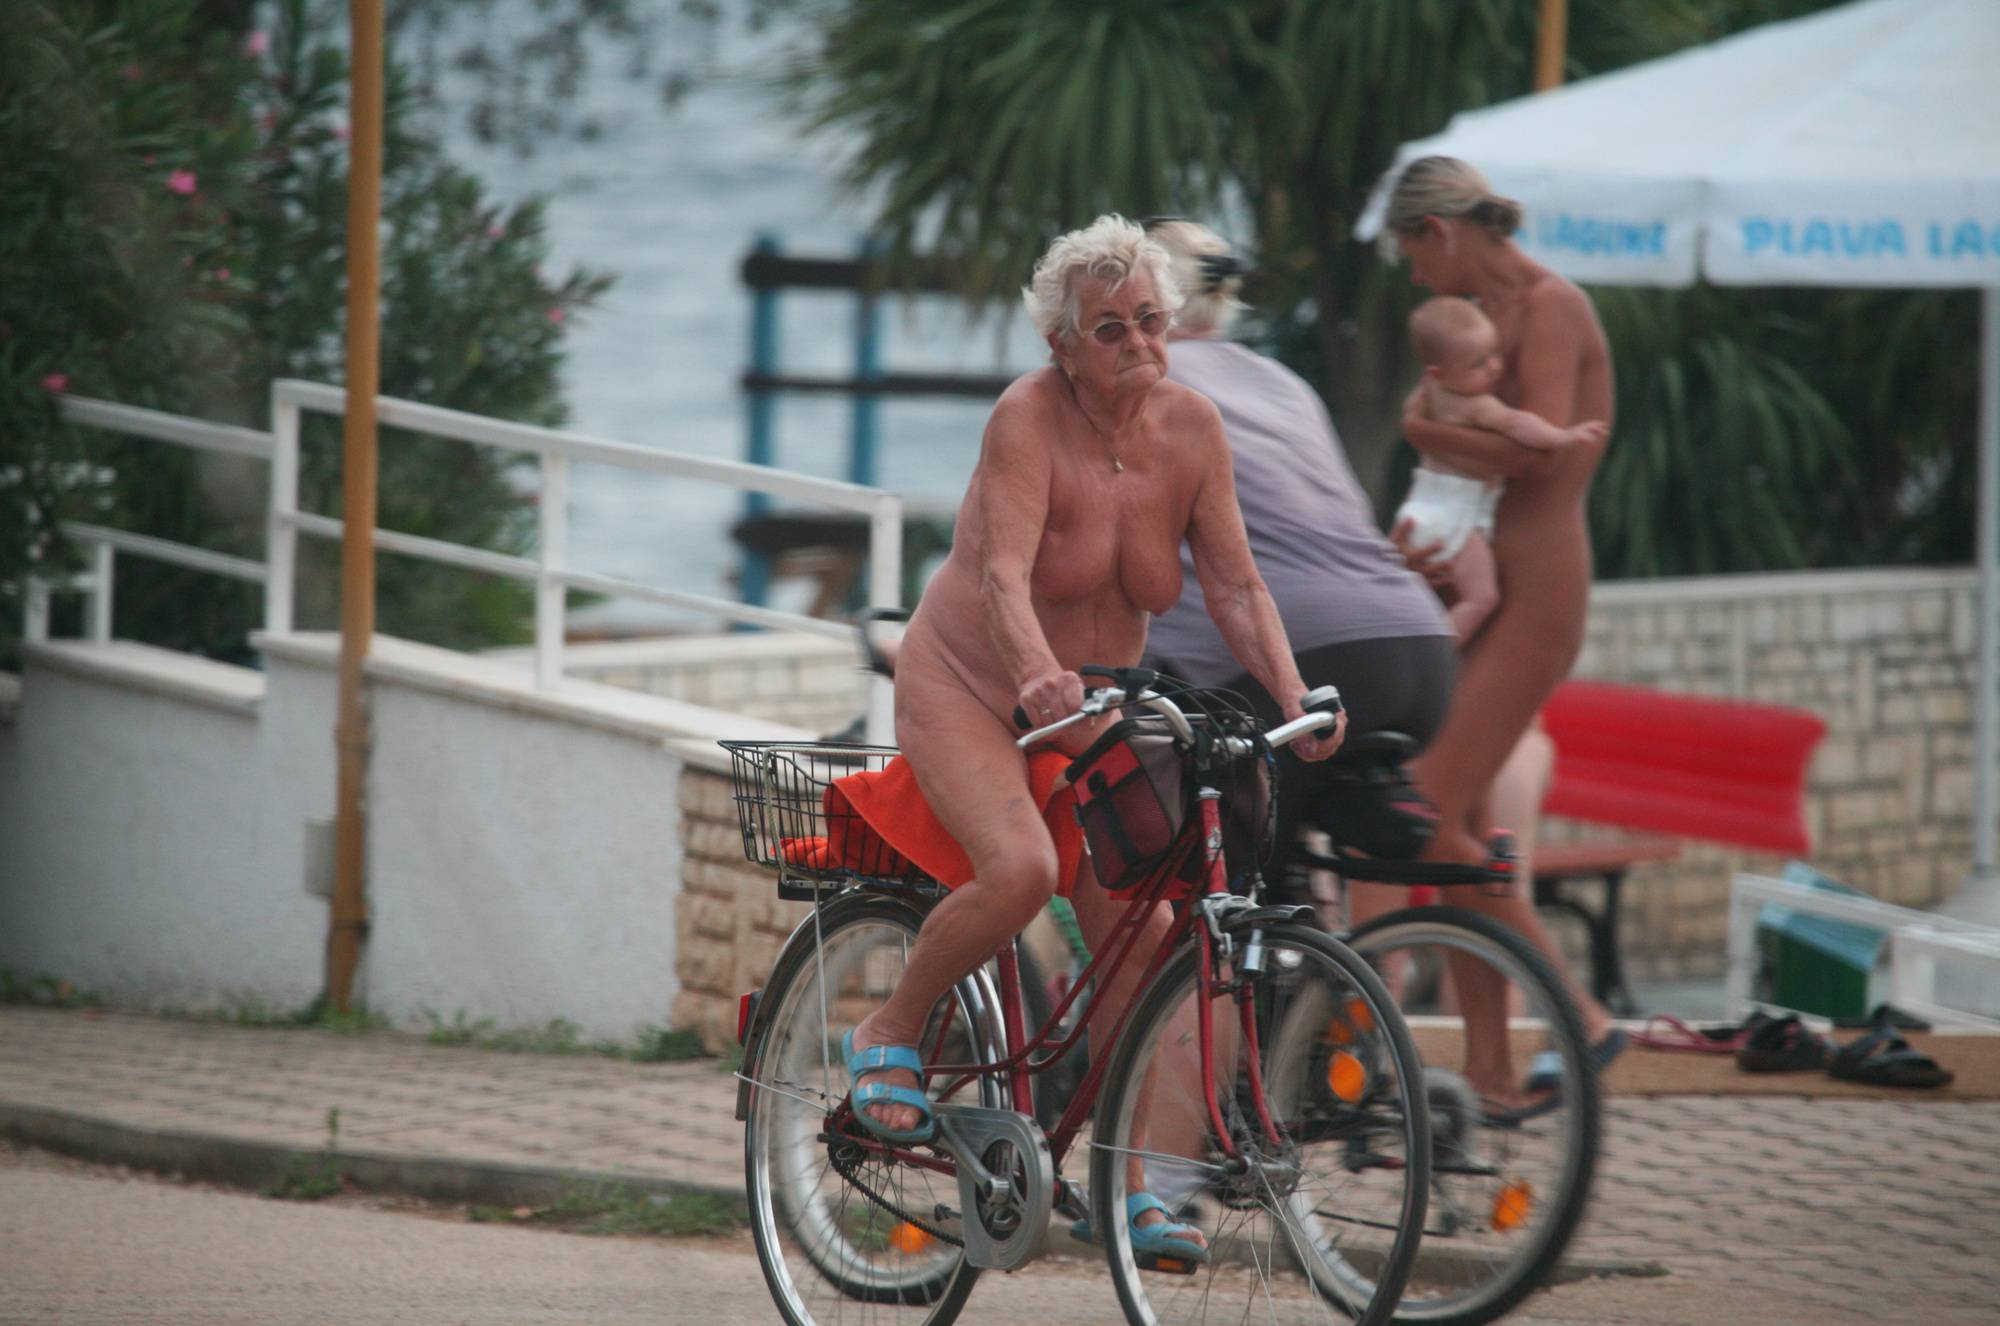 Crete Observed Bikers - 2